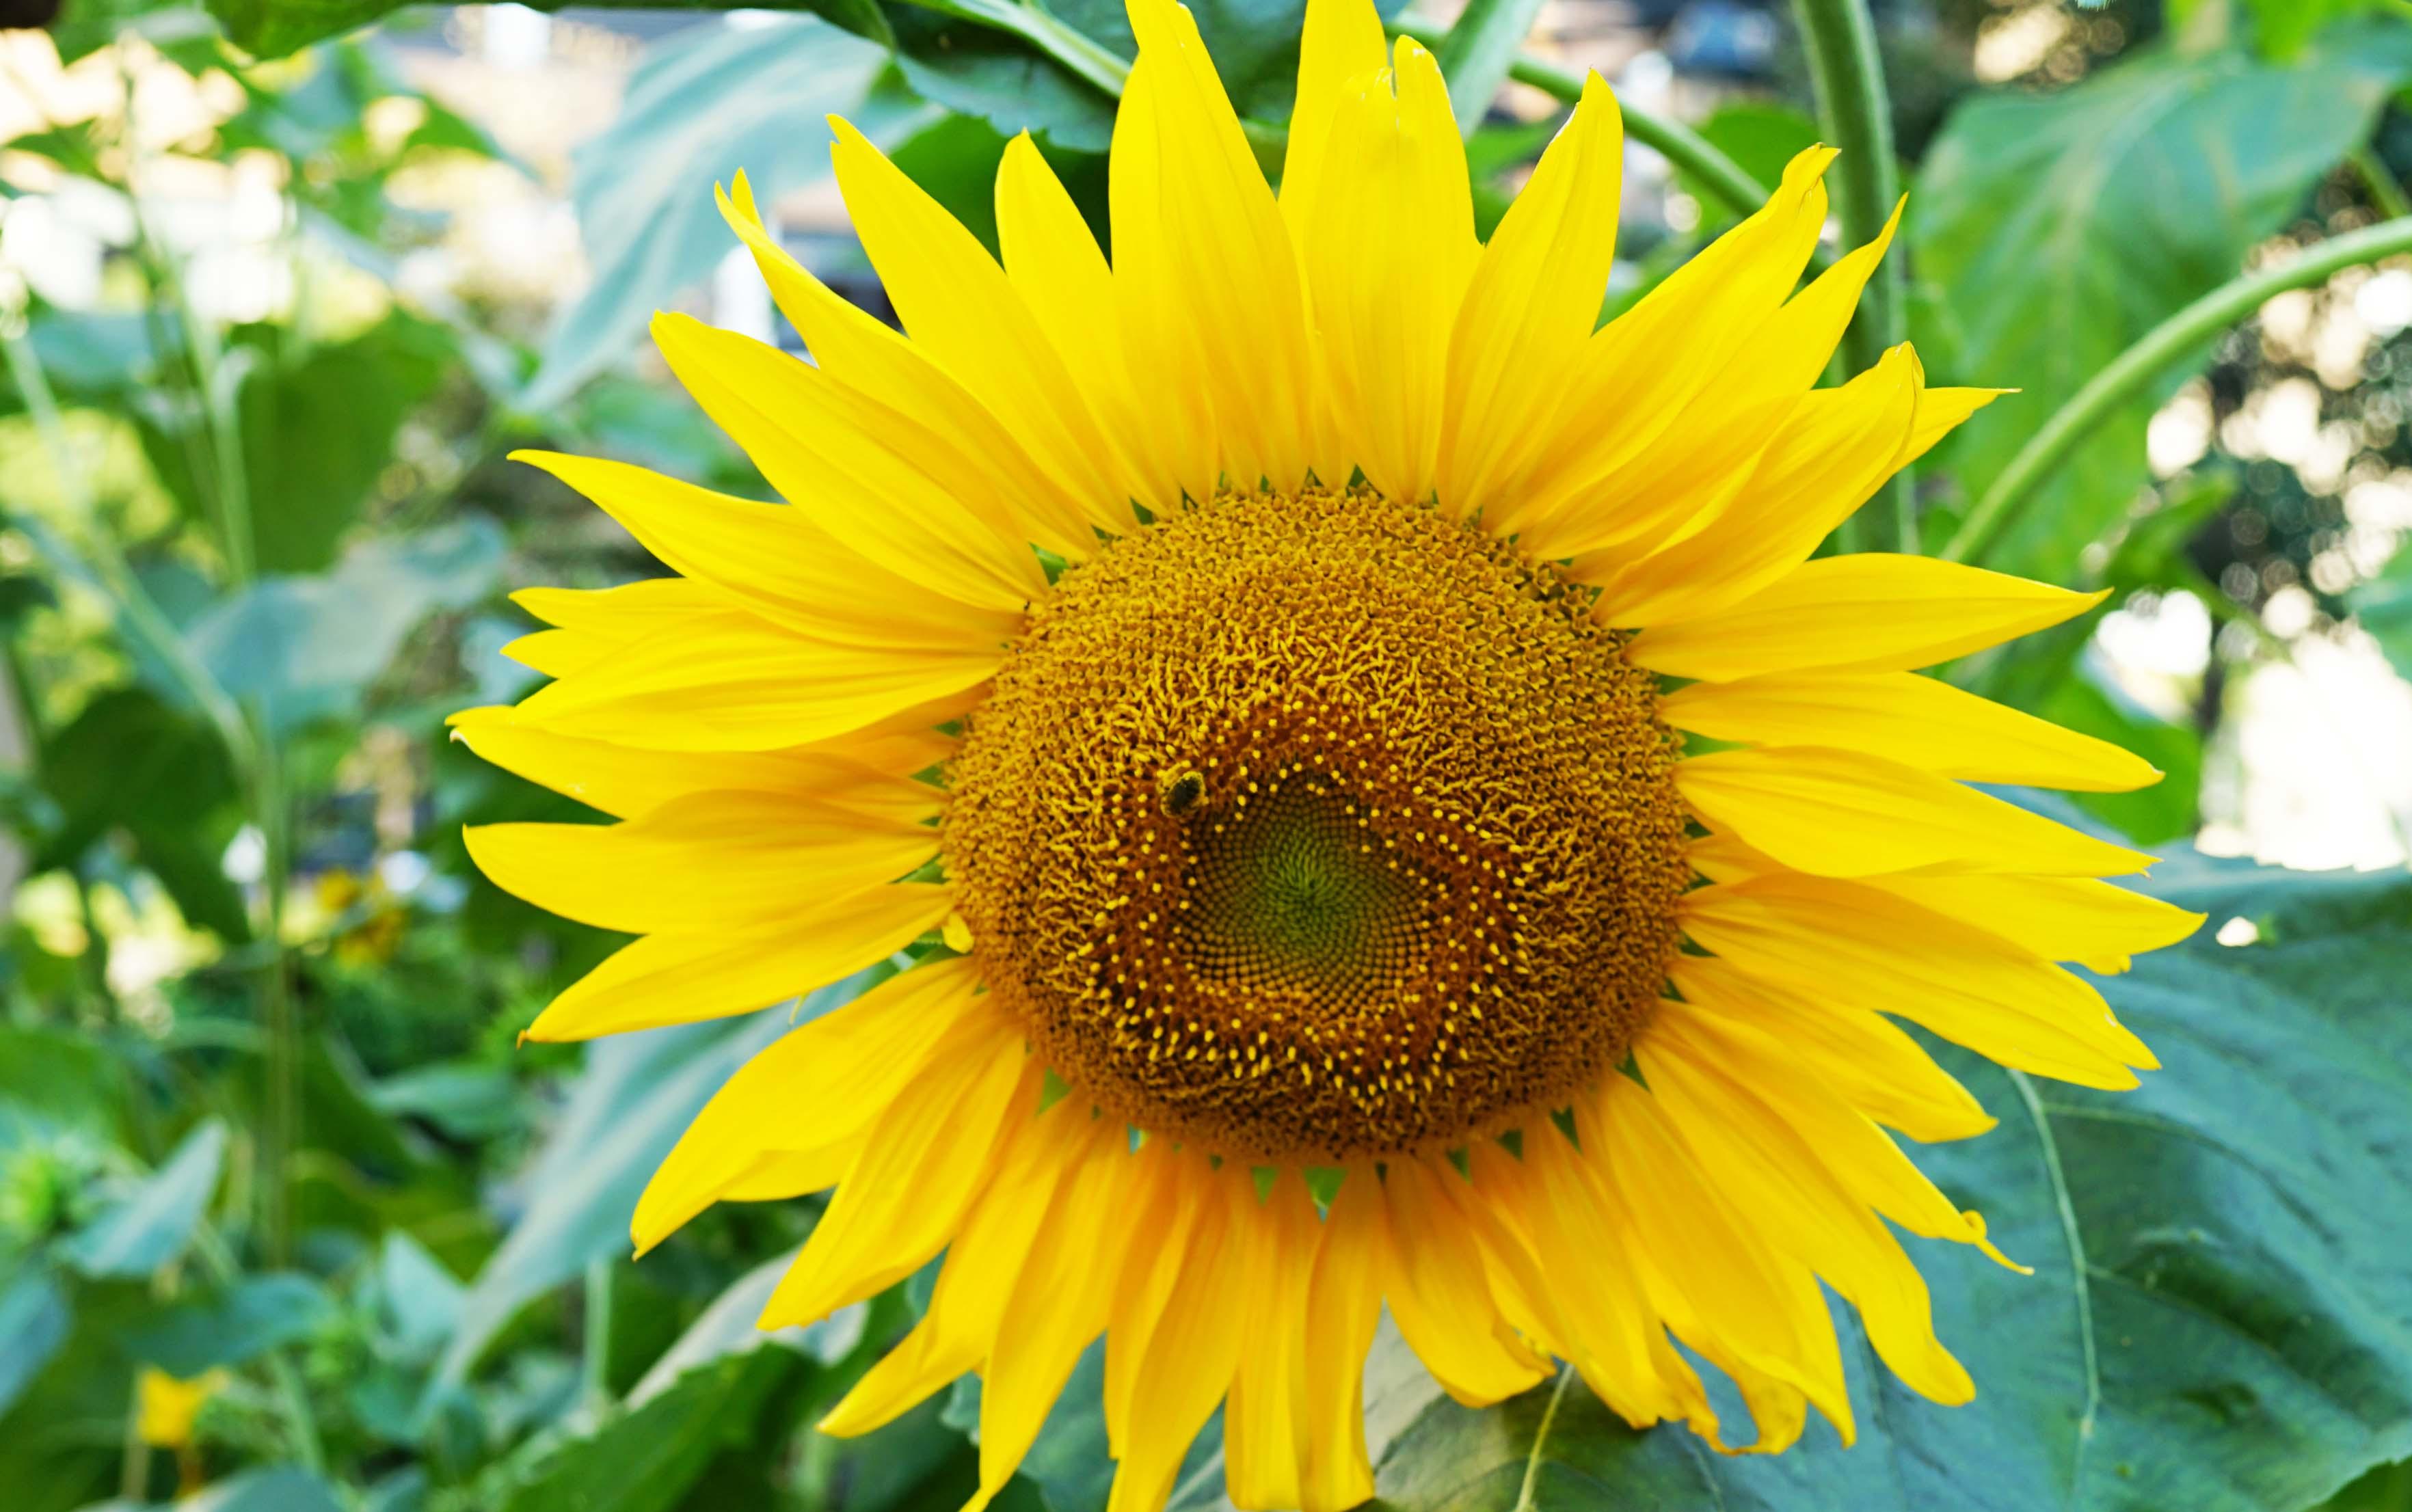 sunflower head 8-24-2015